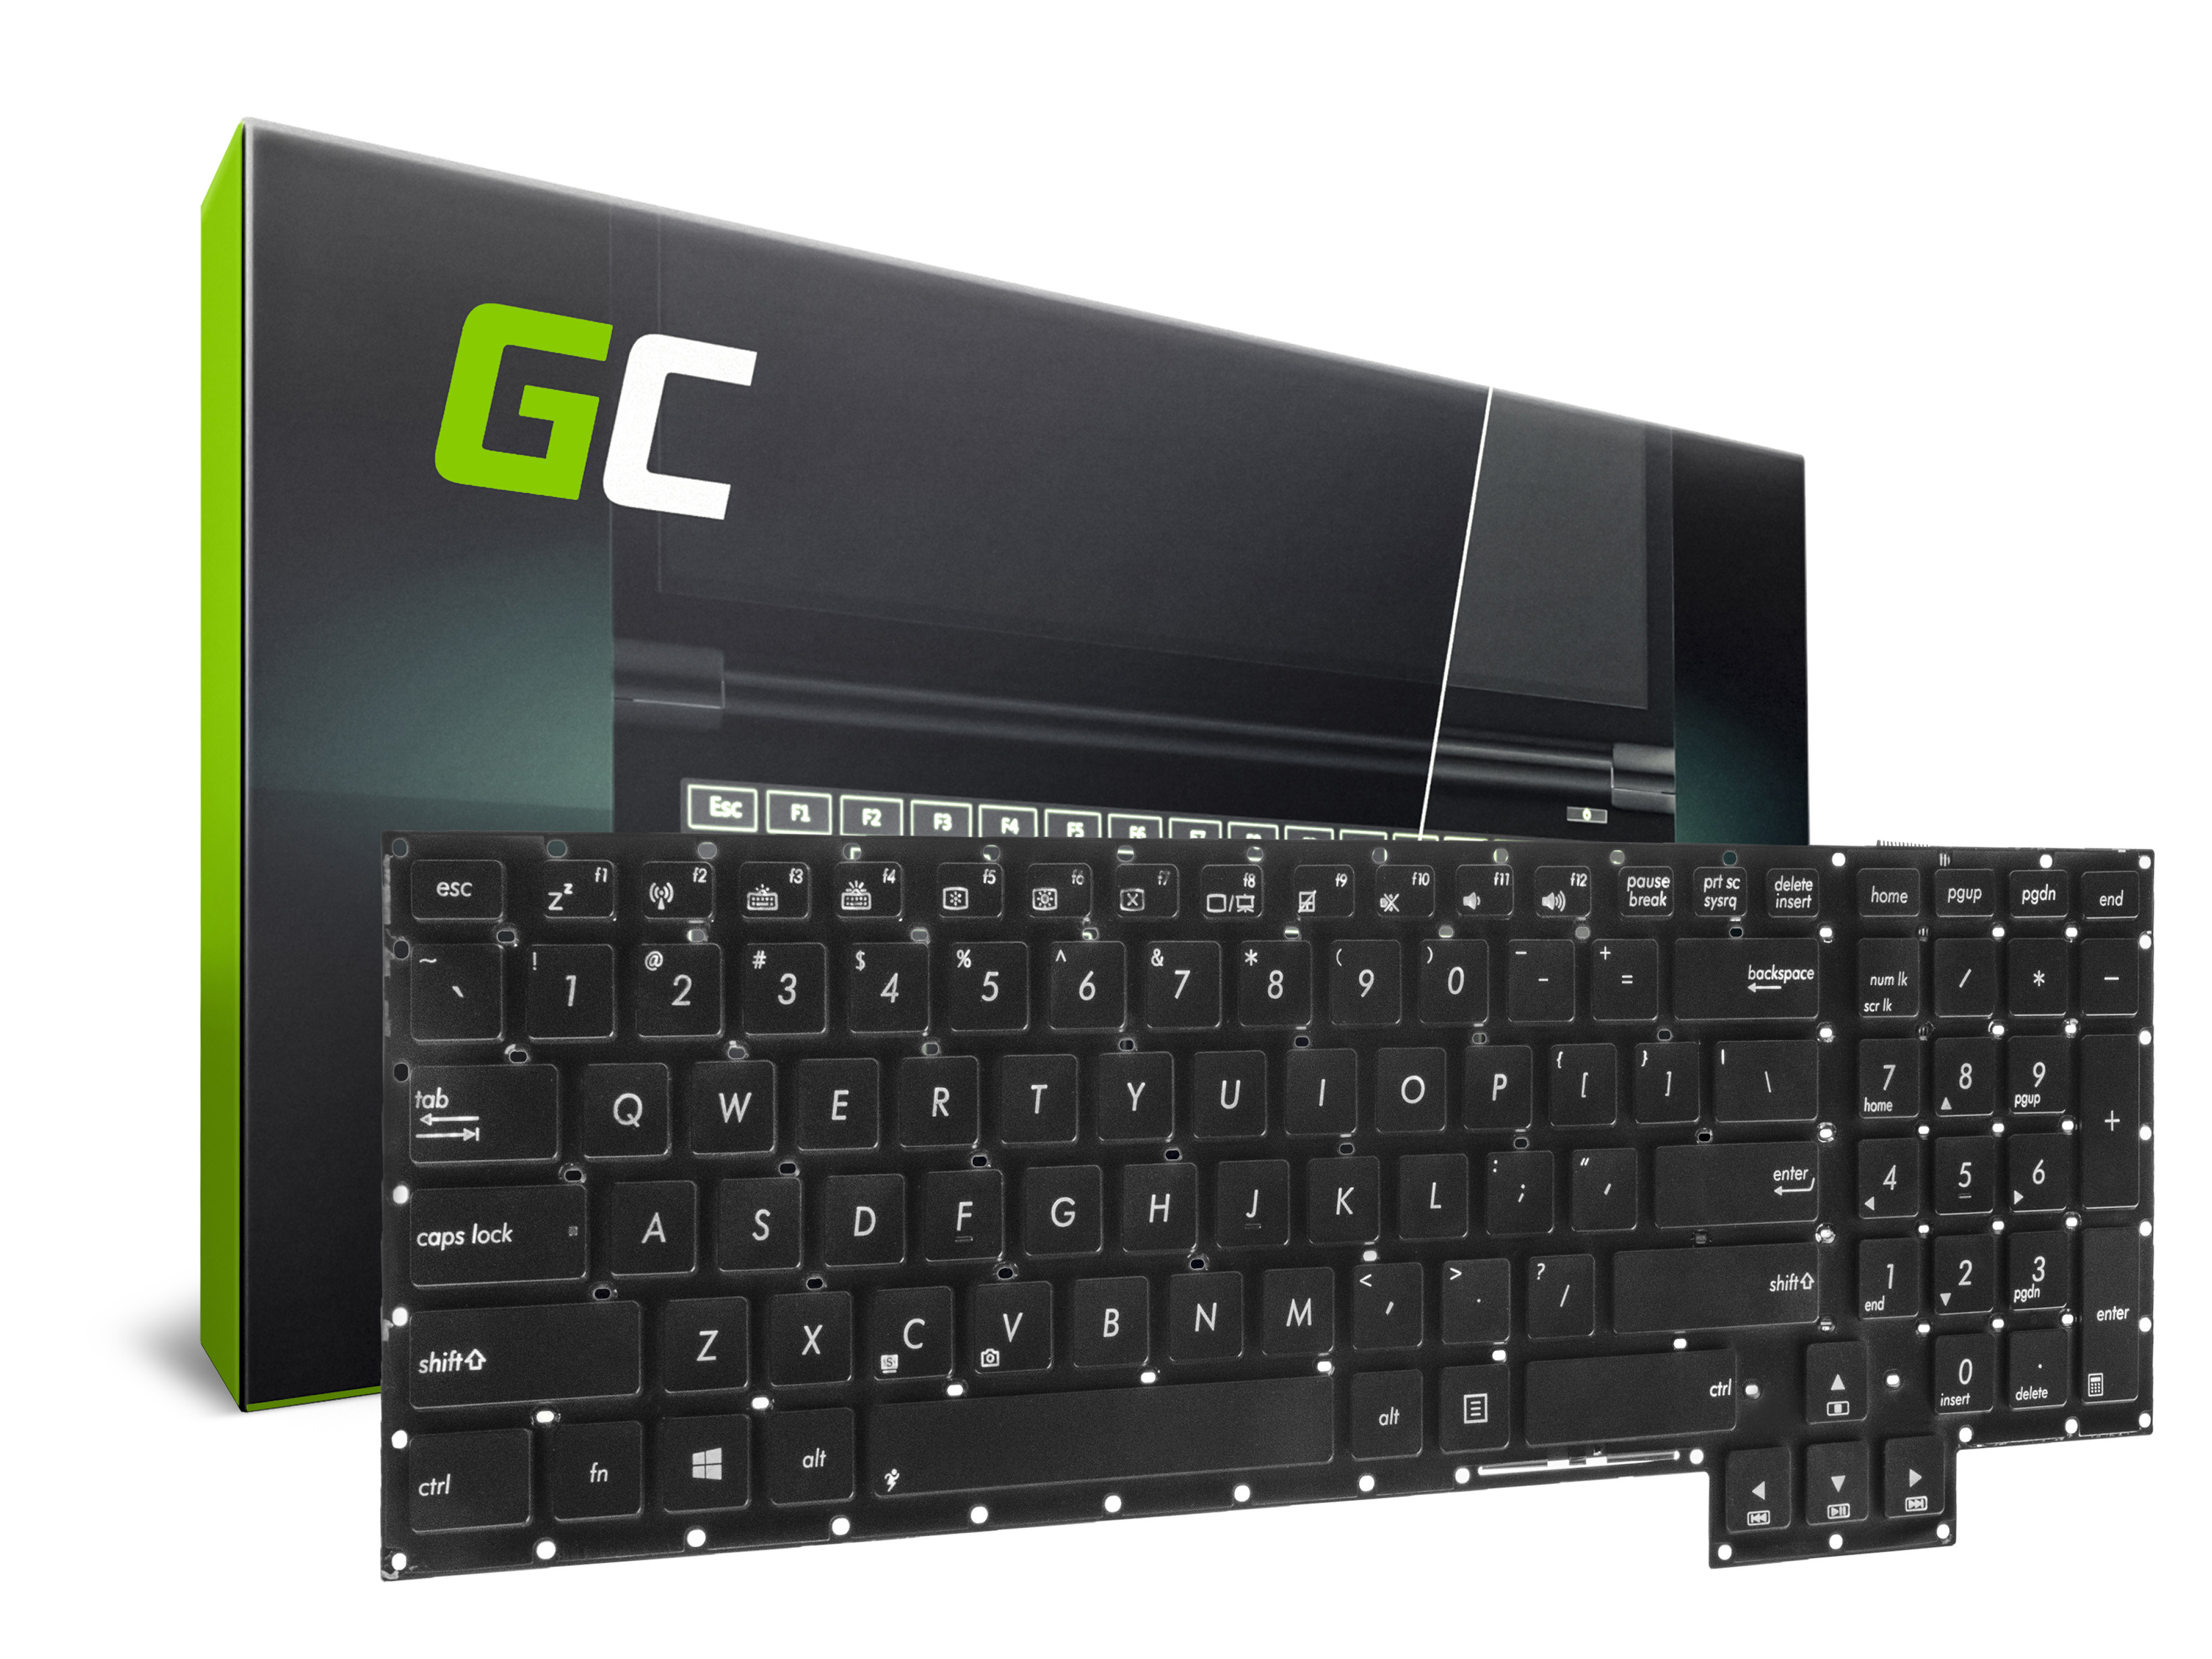 Green Cell Klávesnice pro notebook Asus ROG G750 G750J G750JH G750JM G750JS G750JW